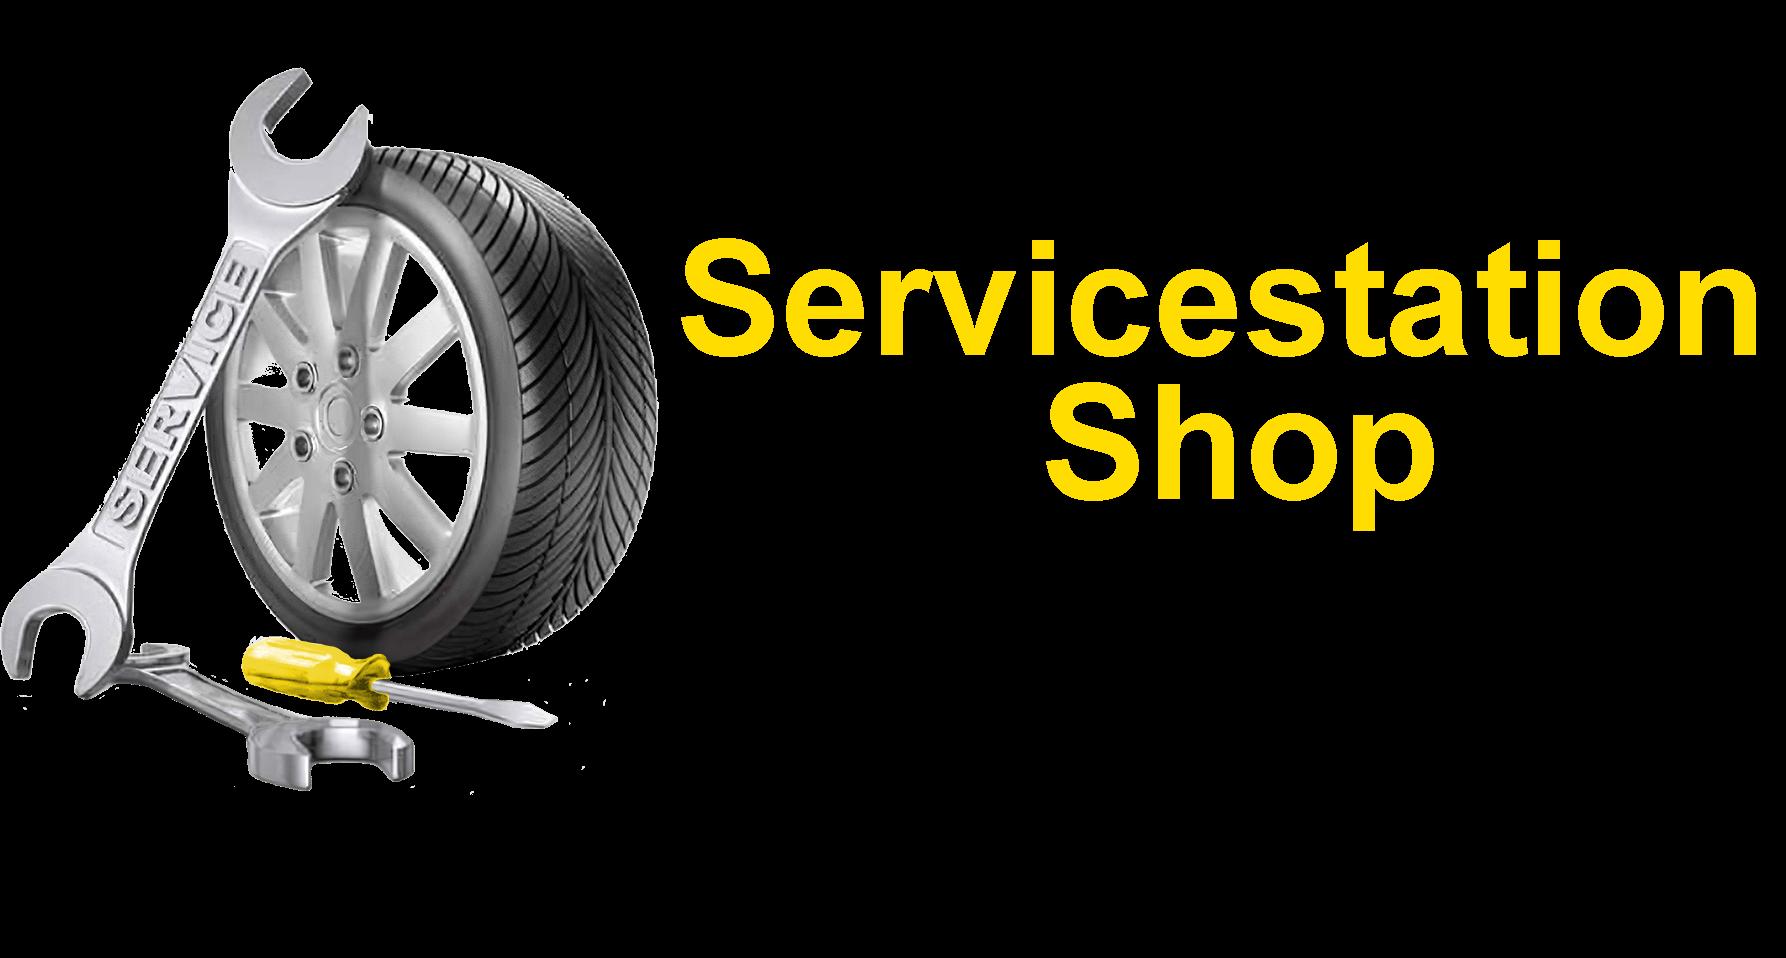 servicestation-shop-fourniermanuel-logo-gelb